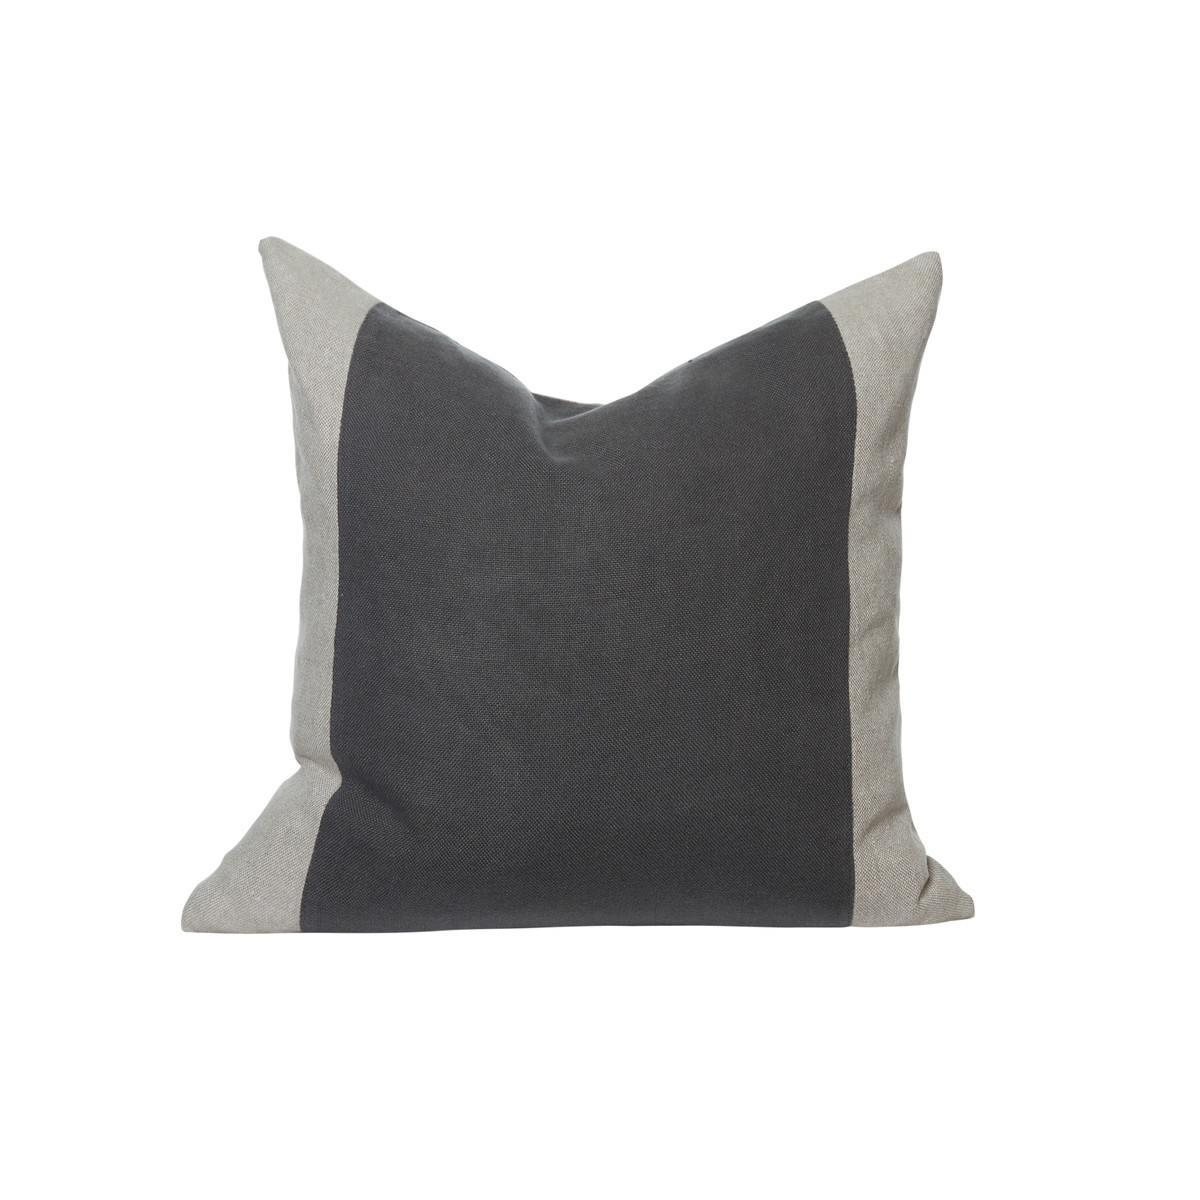 Christina Charcoal Linen Pillow 22 - Front